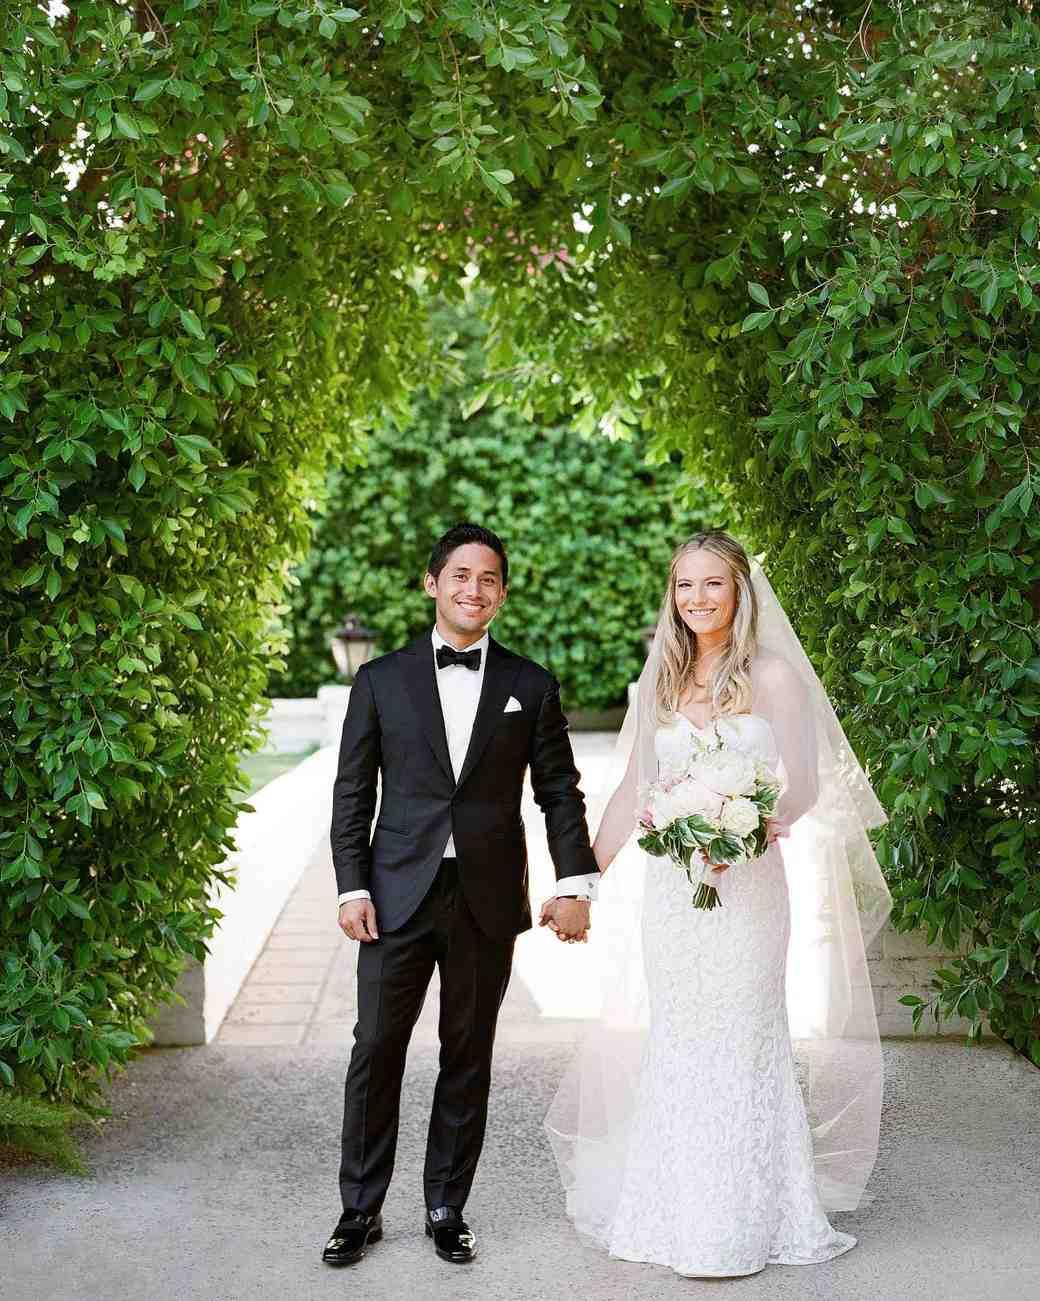 Casual Backyard Wedding Dresses How To Match